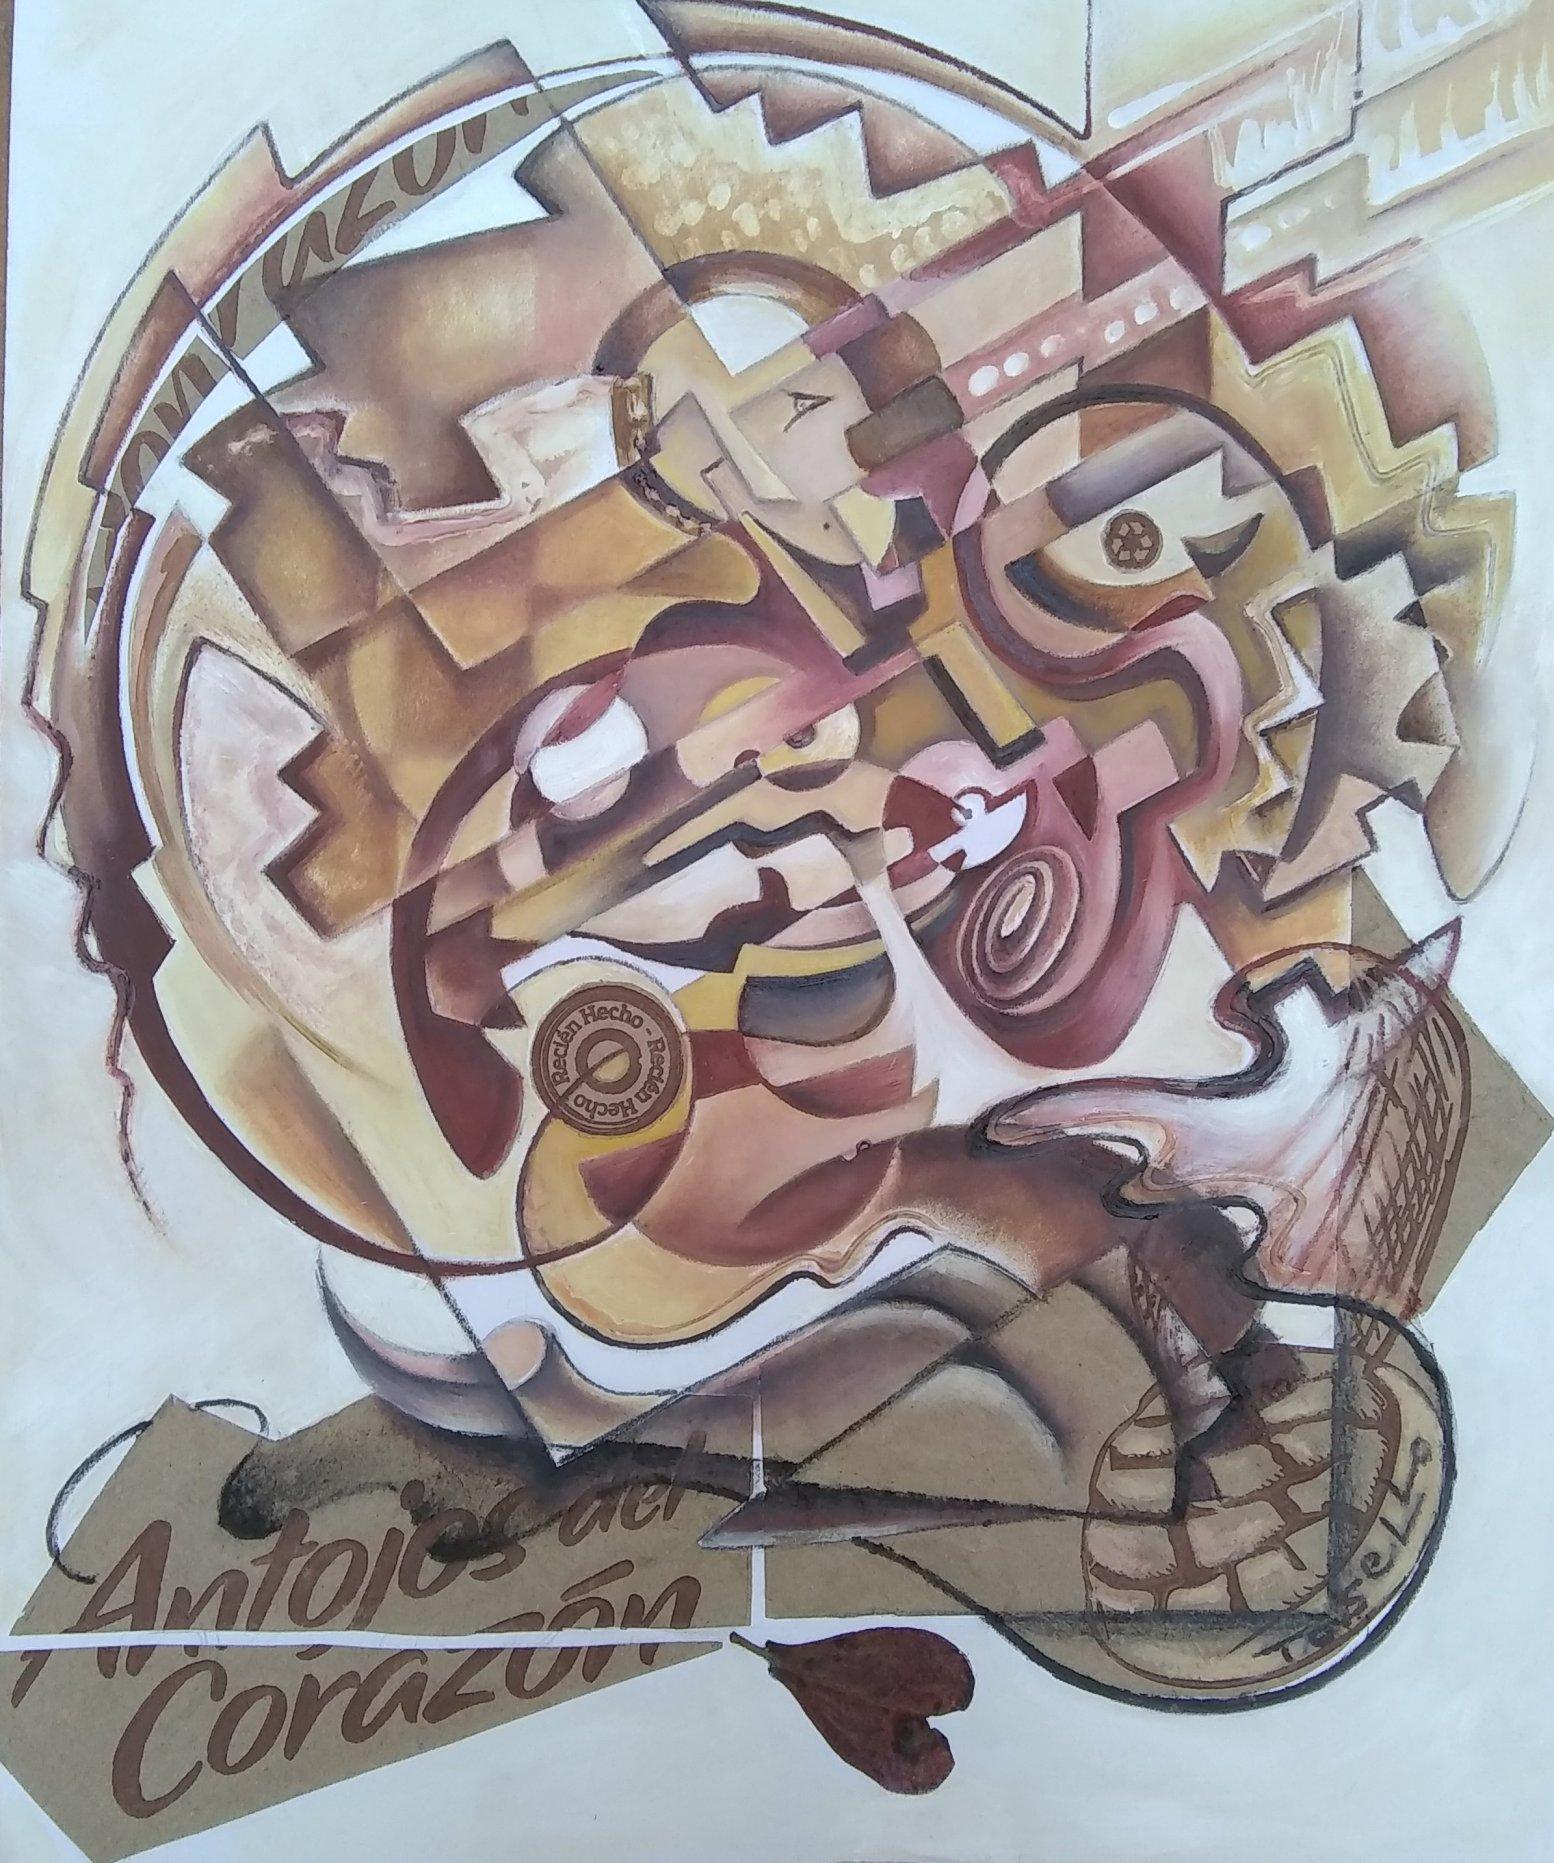 Antojos del Corazón (2020) - Gabriela Tosello - Gaby Tosello